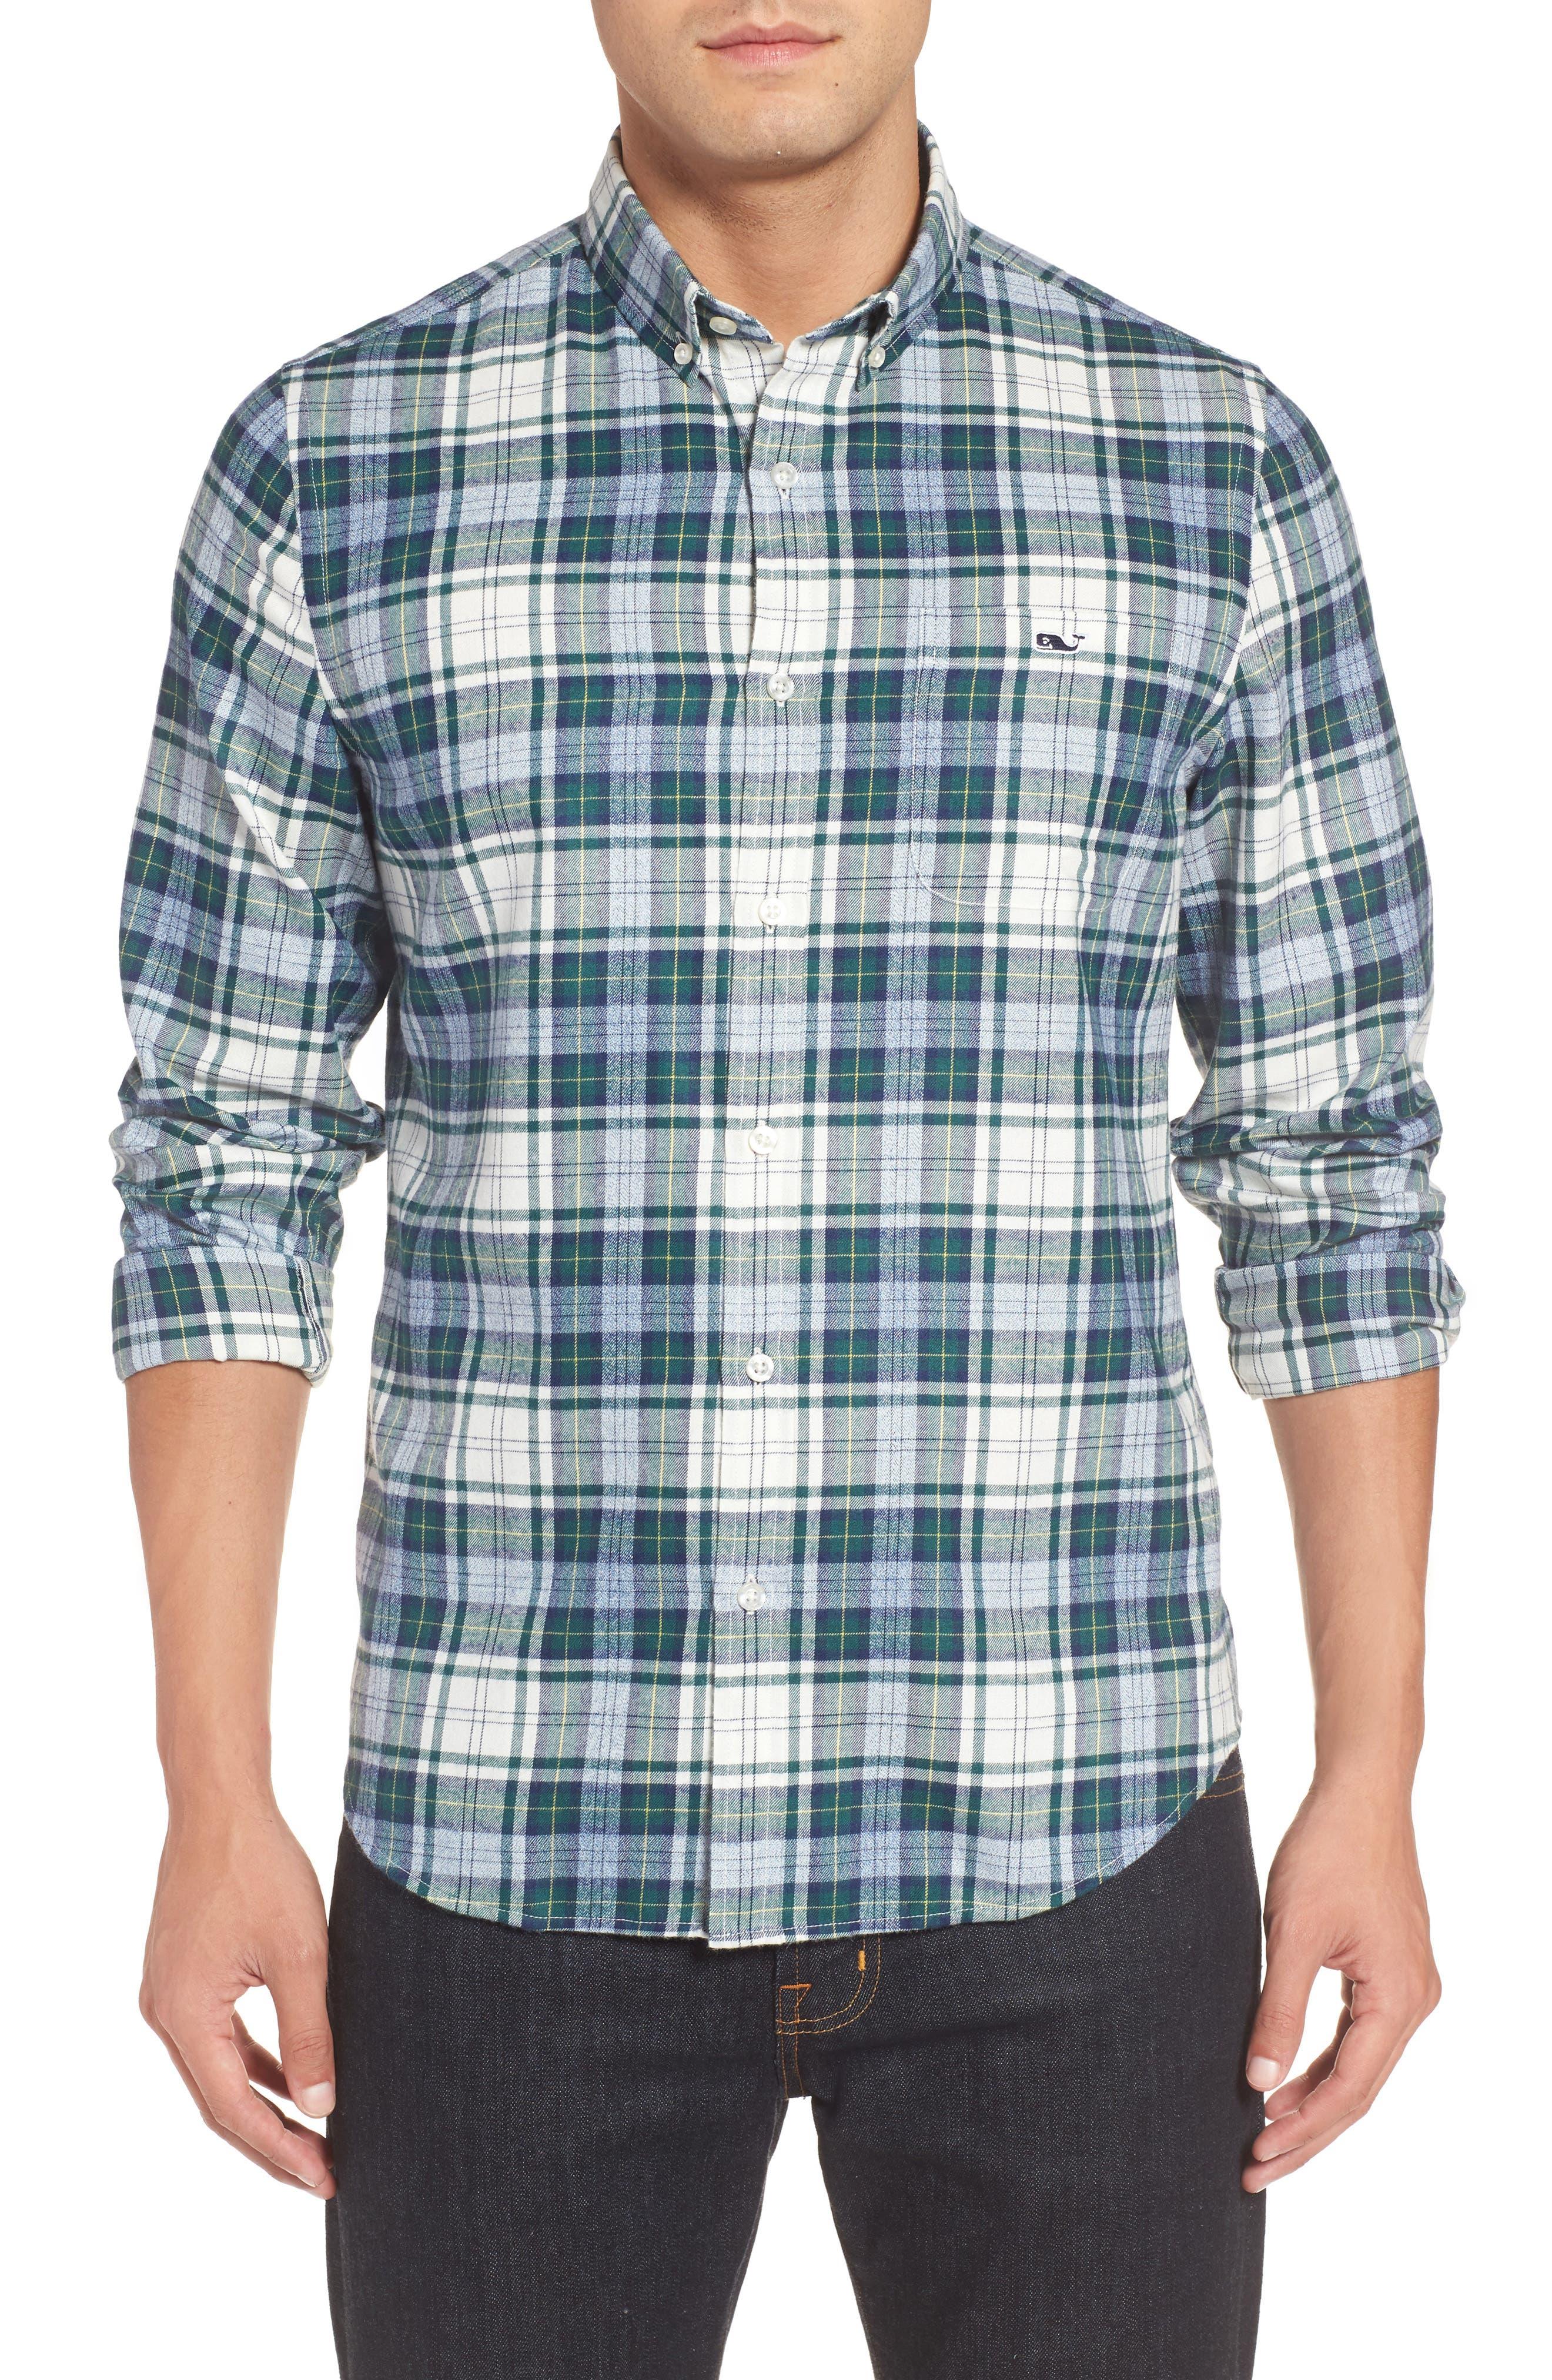 Tucker Hayward Point Slim Fit Plaid Sport Shirt,                             Main thumbnail 1, color,                             342